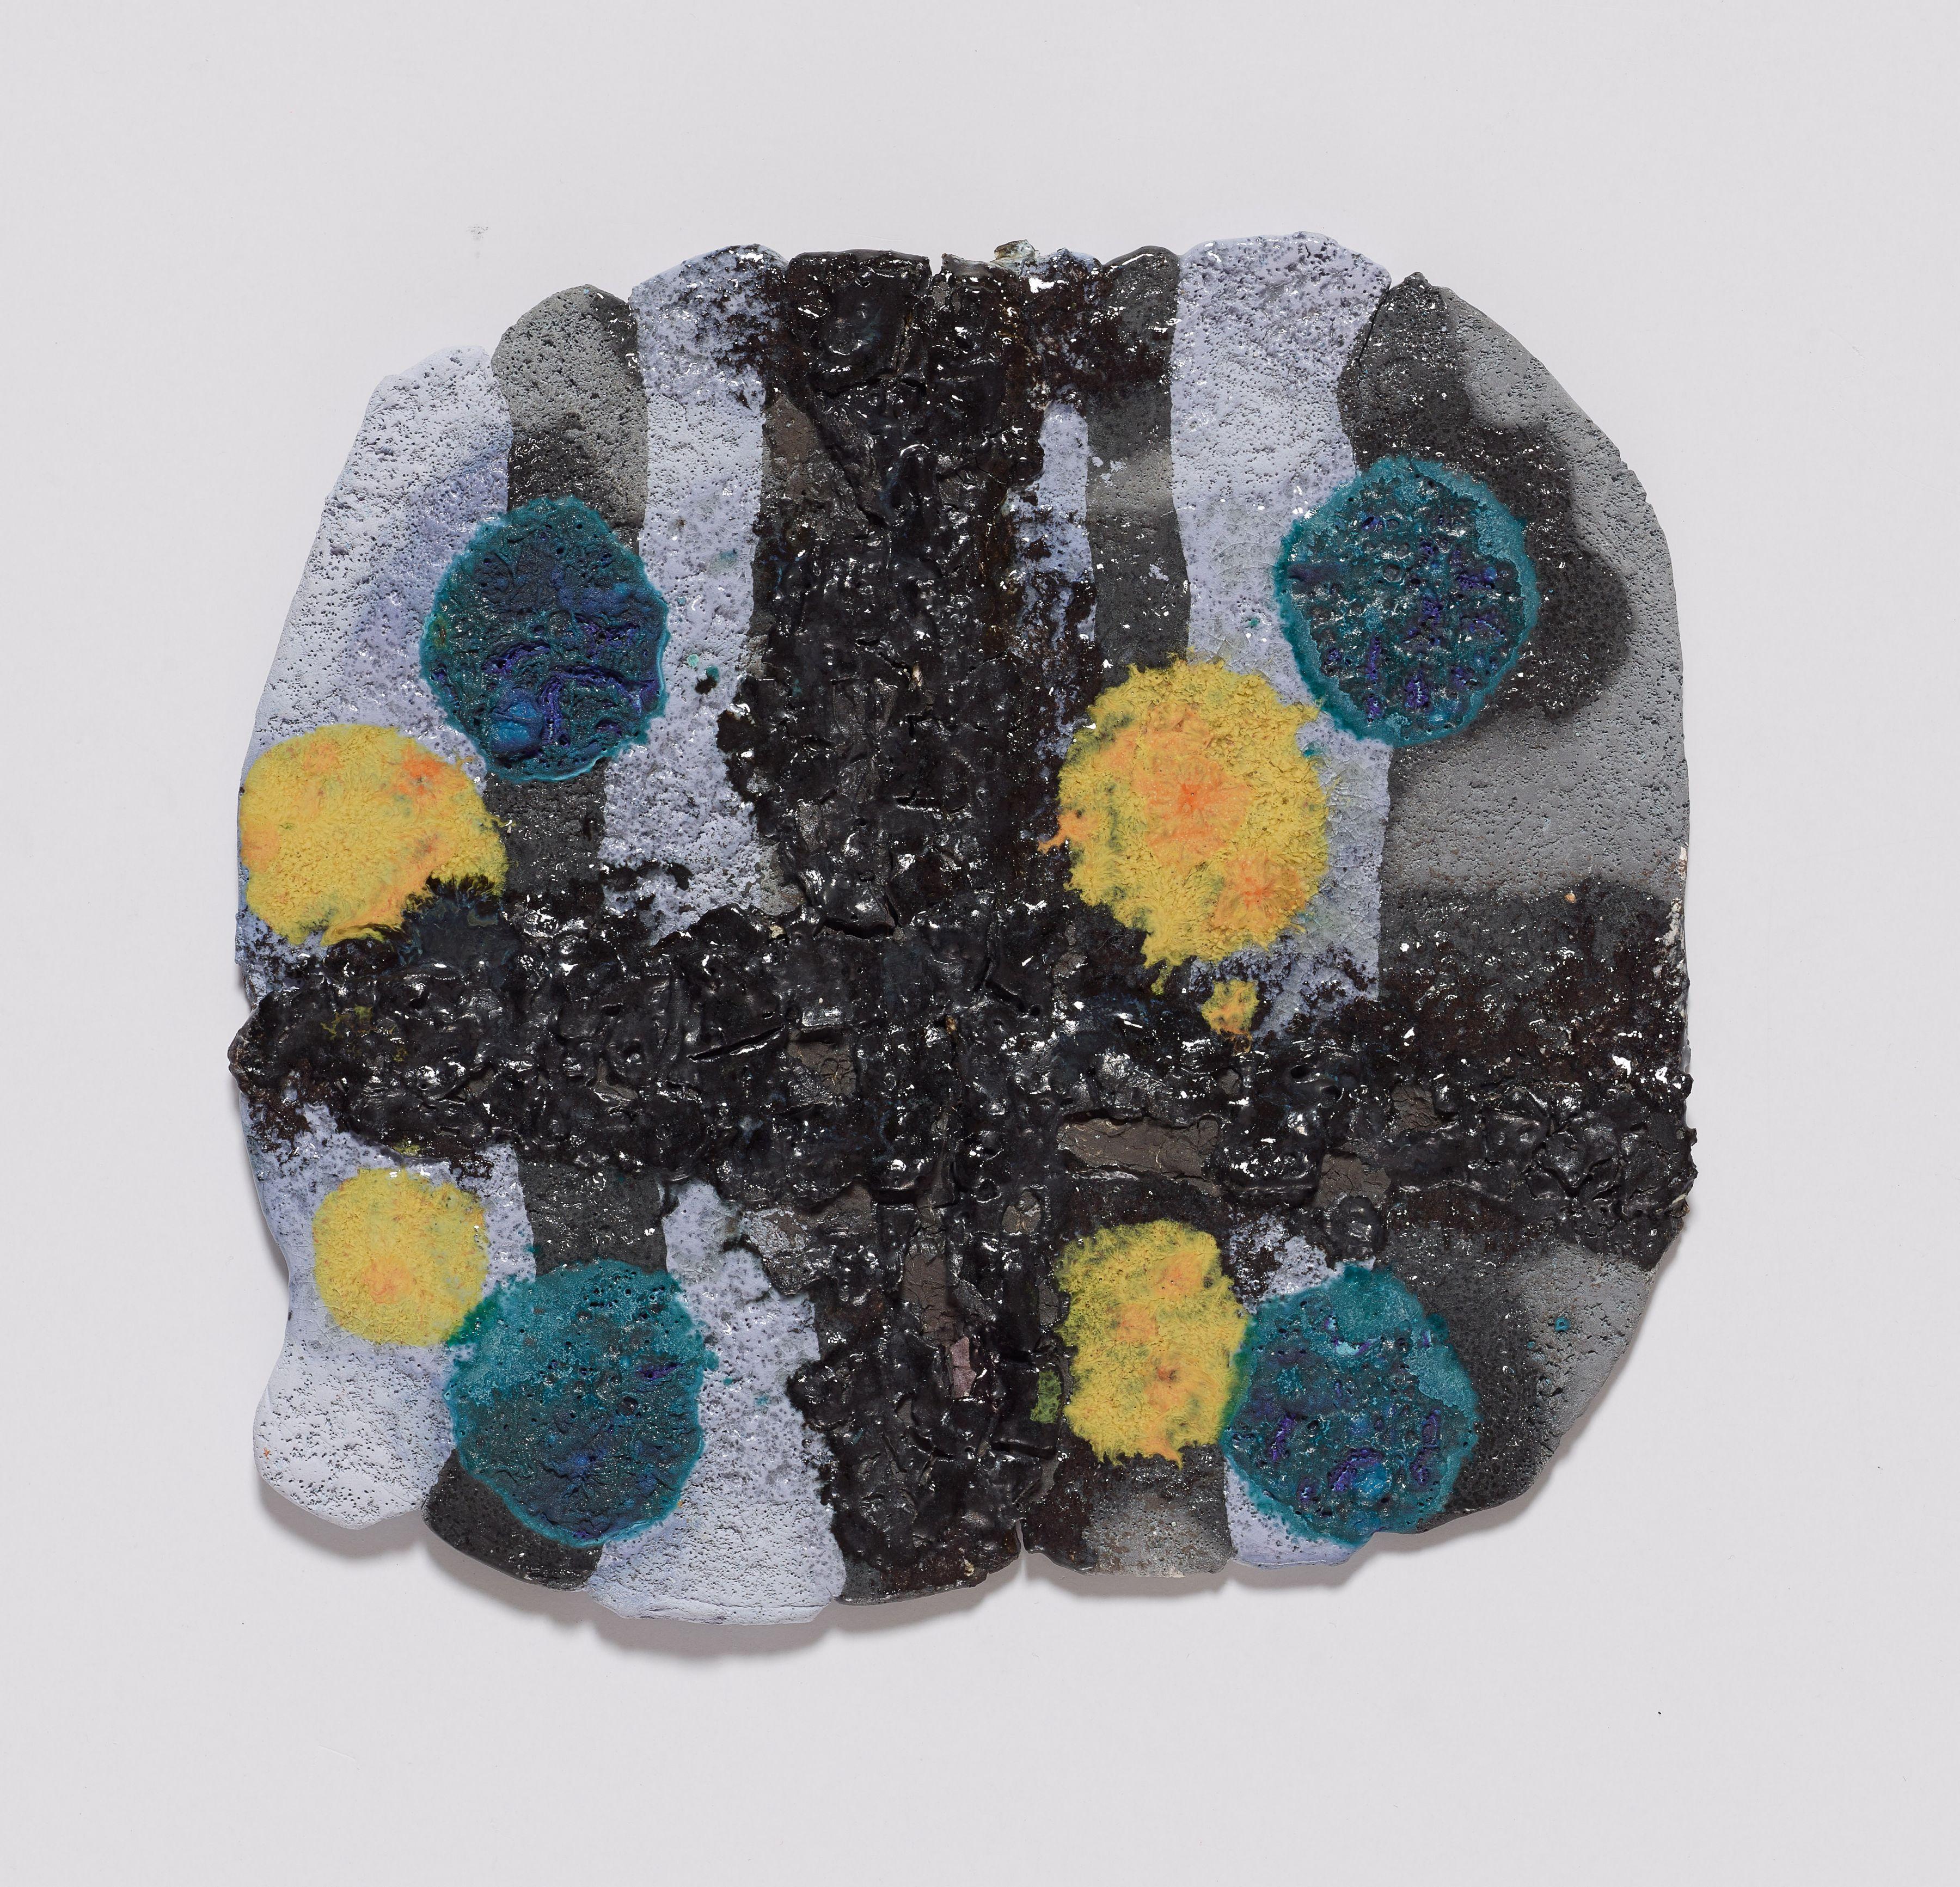 Hannah, 2014, Colored porcelain and glaze